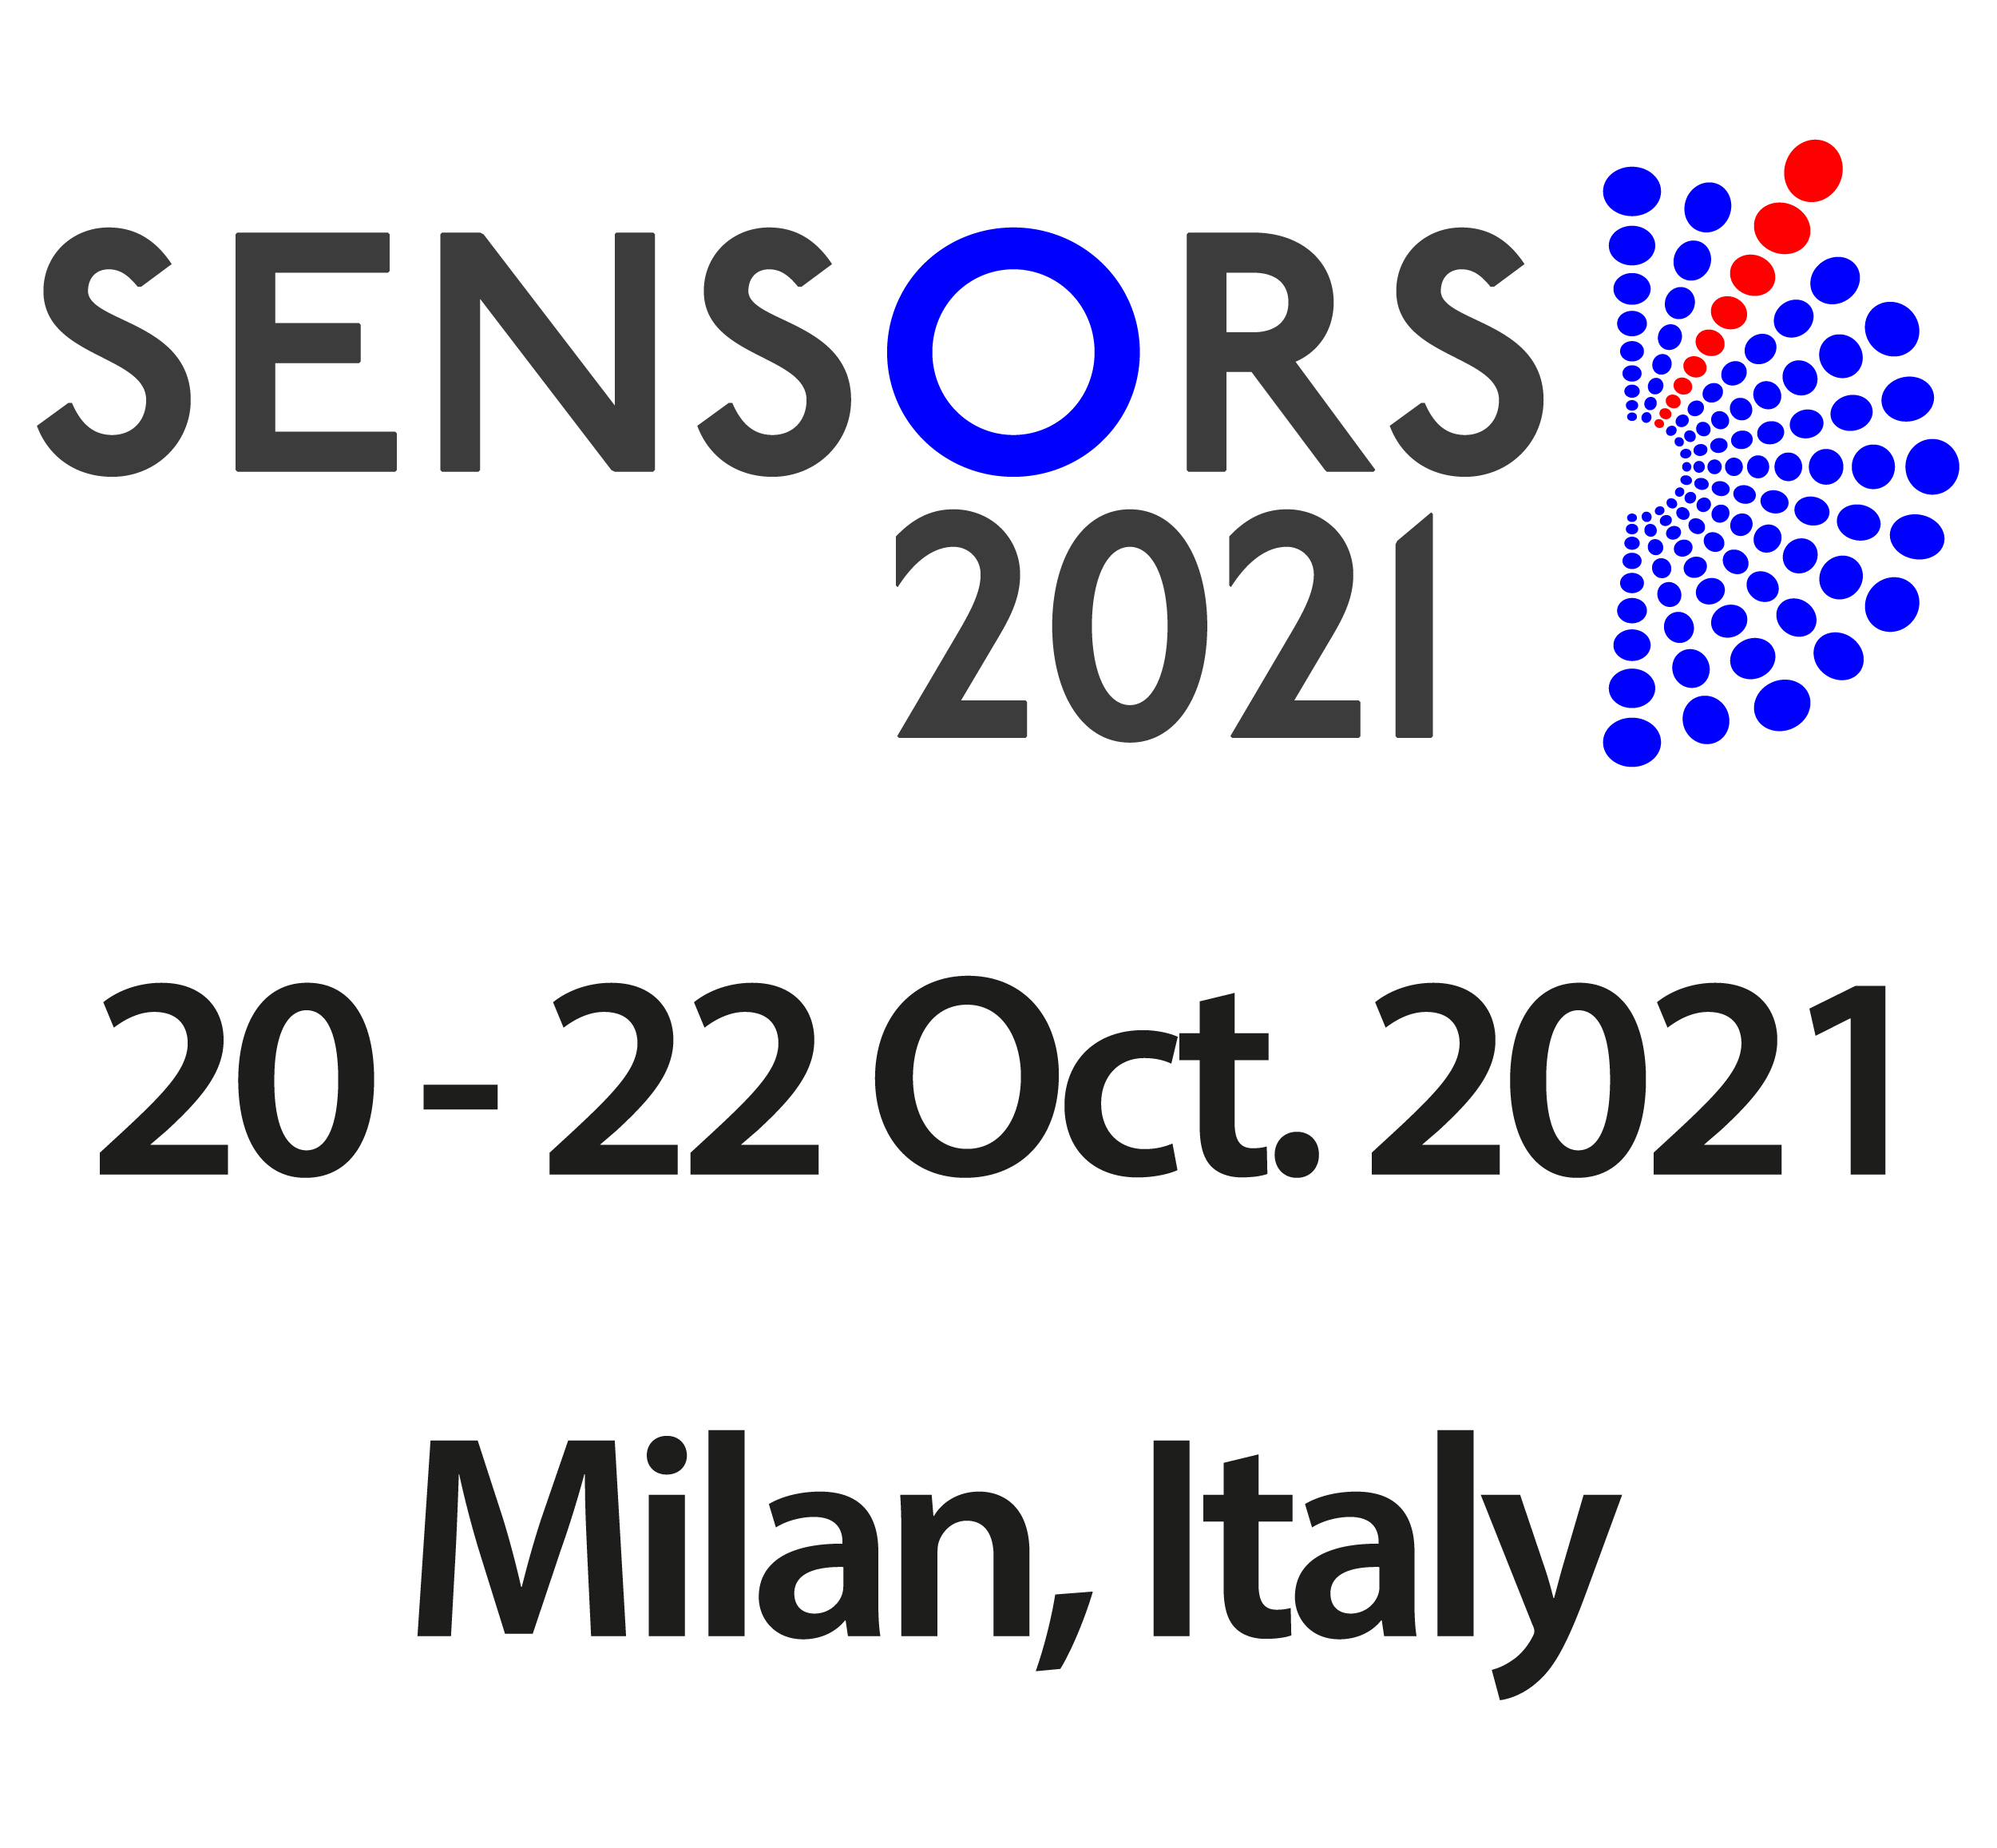 Sensors 2021 International Conference